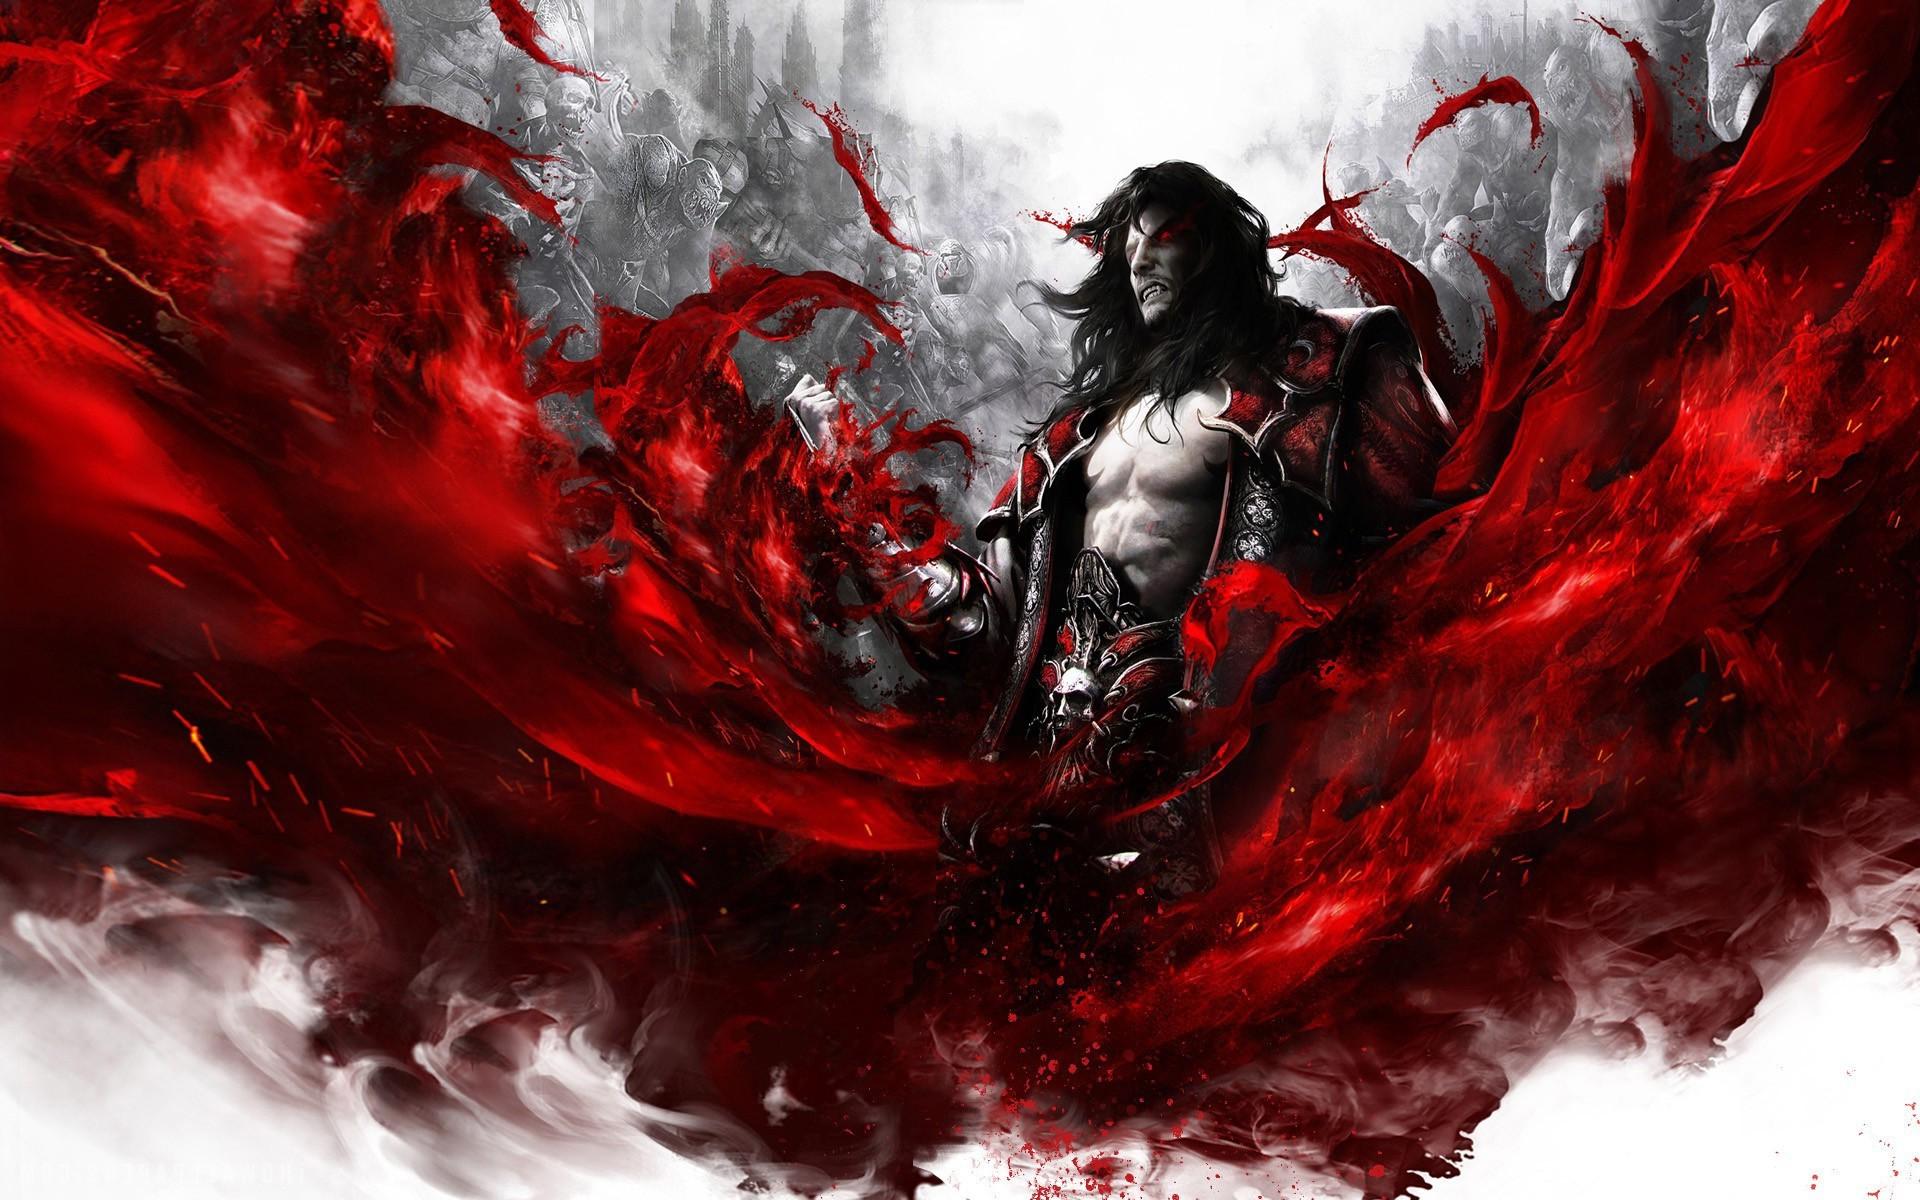 Wallpaper : illustration, video games, red, blood, vampires